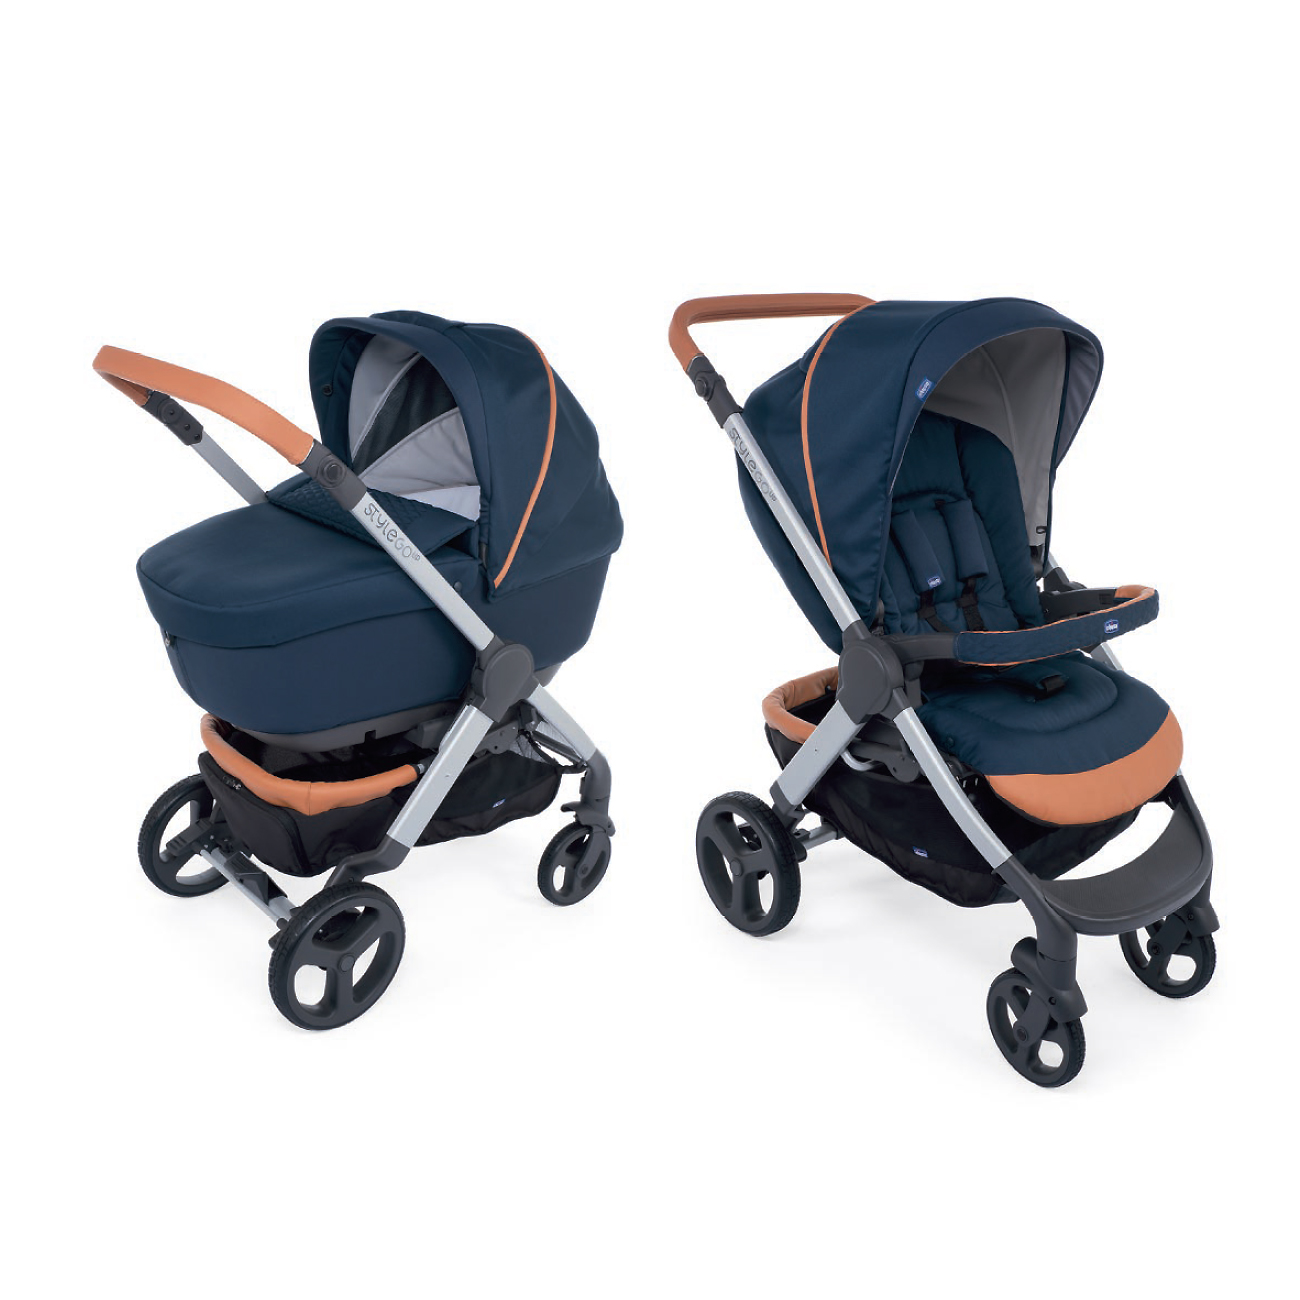 Carucior copii Chicco Duo Style Go Up Crossover, Iconic Blue (Albastru), 0luni+